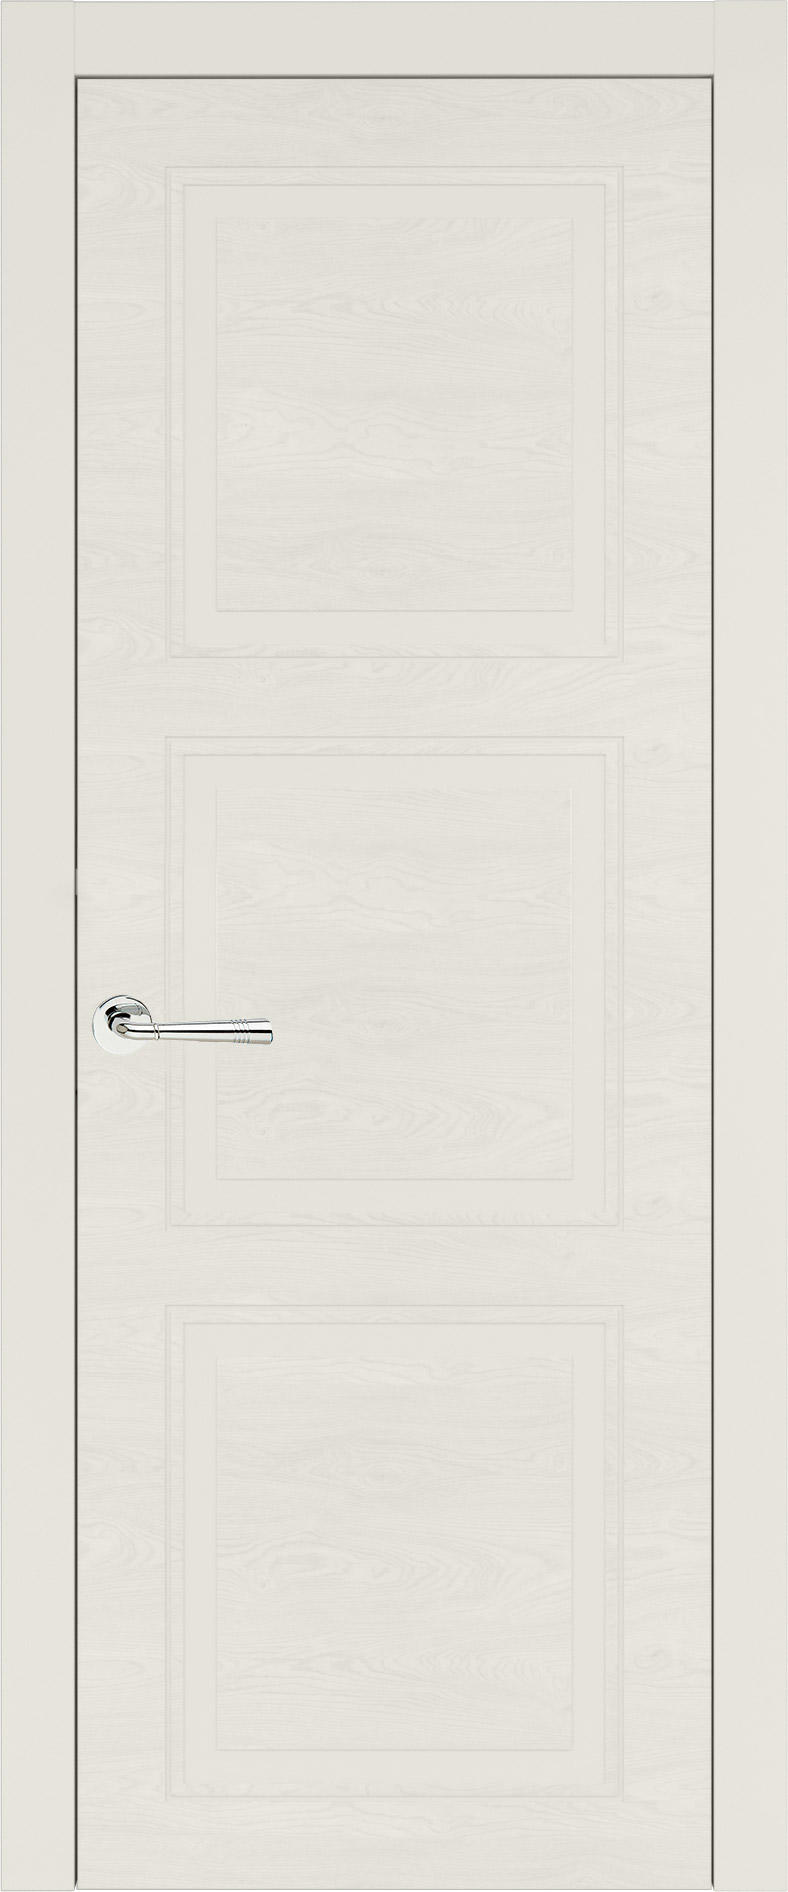 Milano Neo Classic цвет - Бежевая эмаль по шпону (RAL 9010) Без стекла (ДГ)